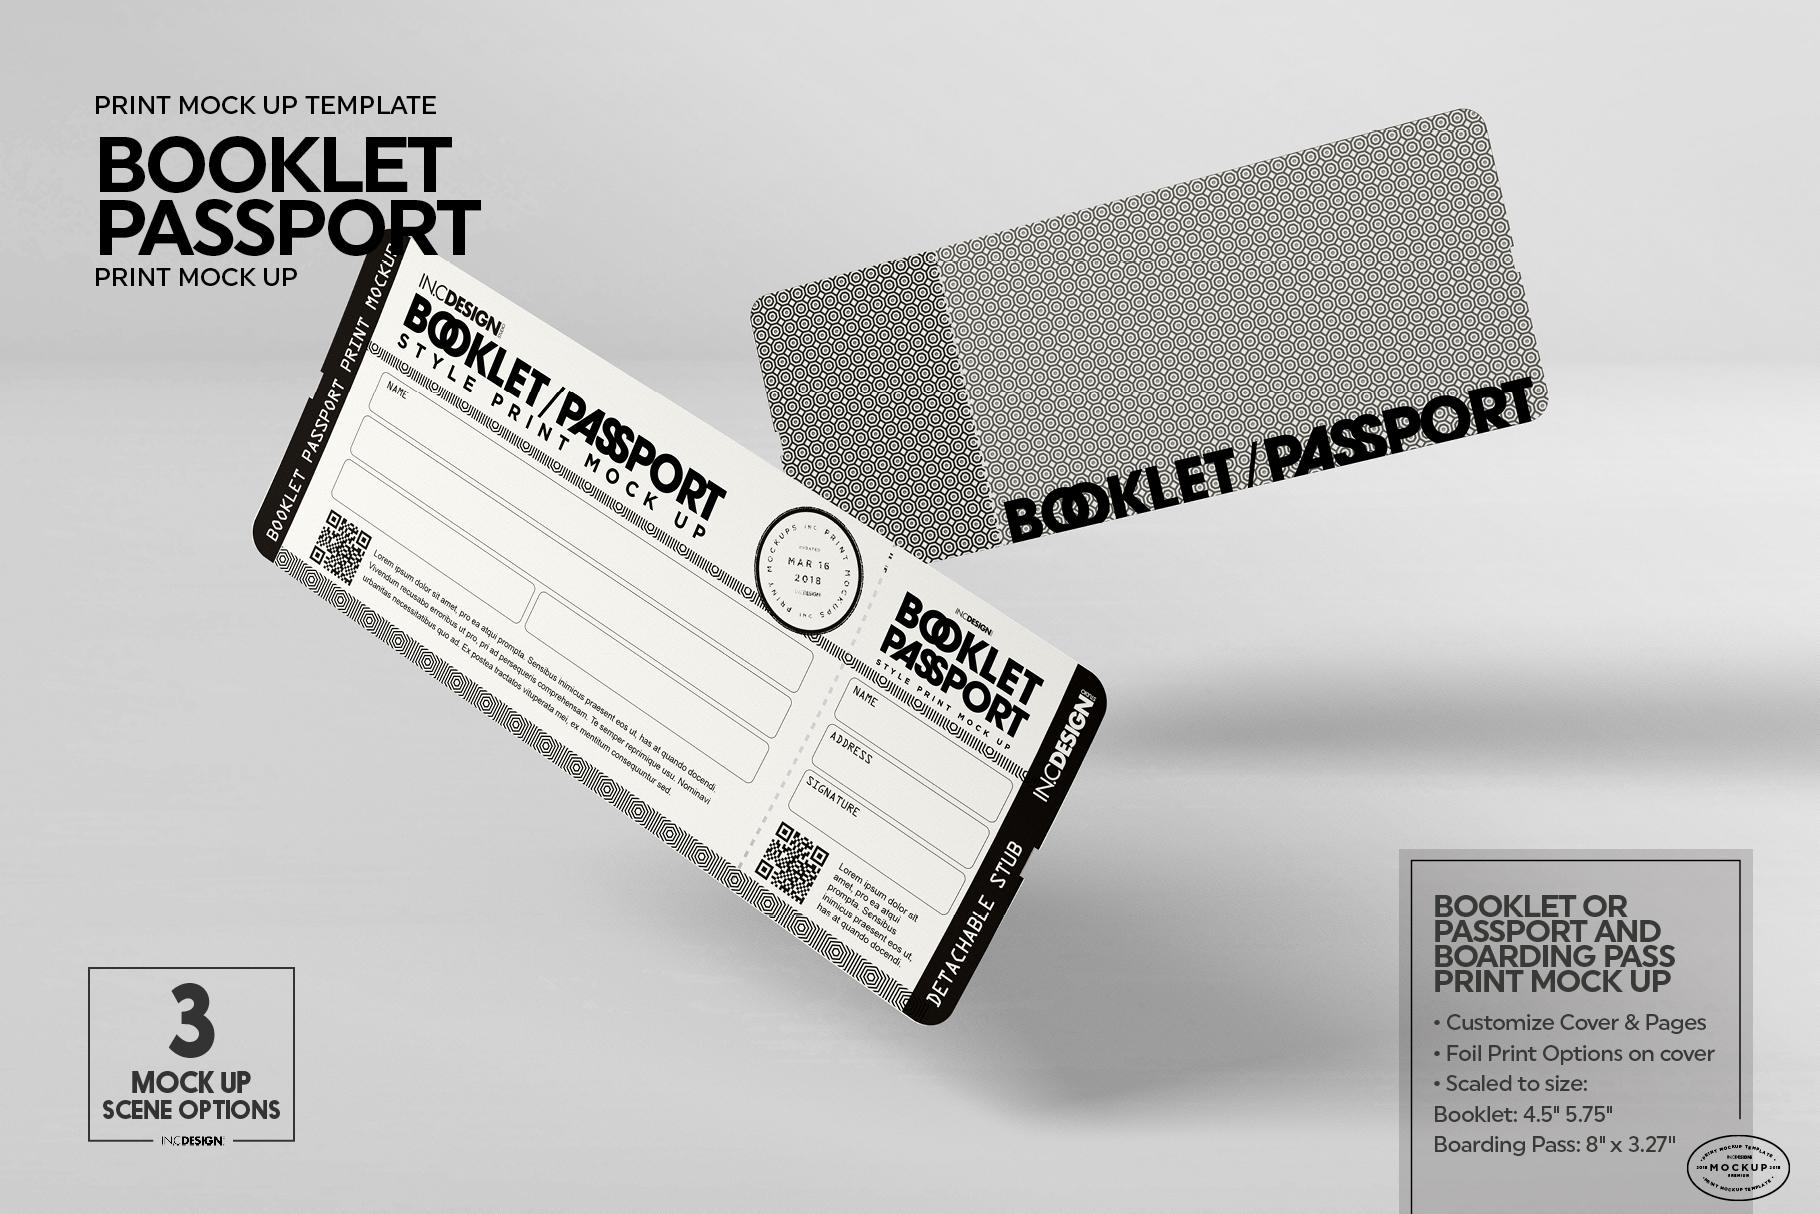 Booklet Passport Print MockUp example image 5